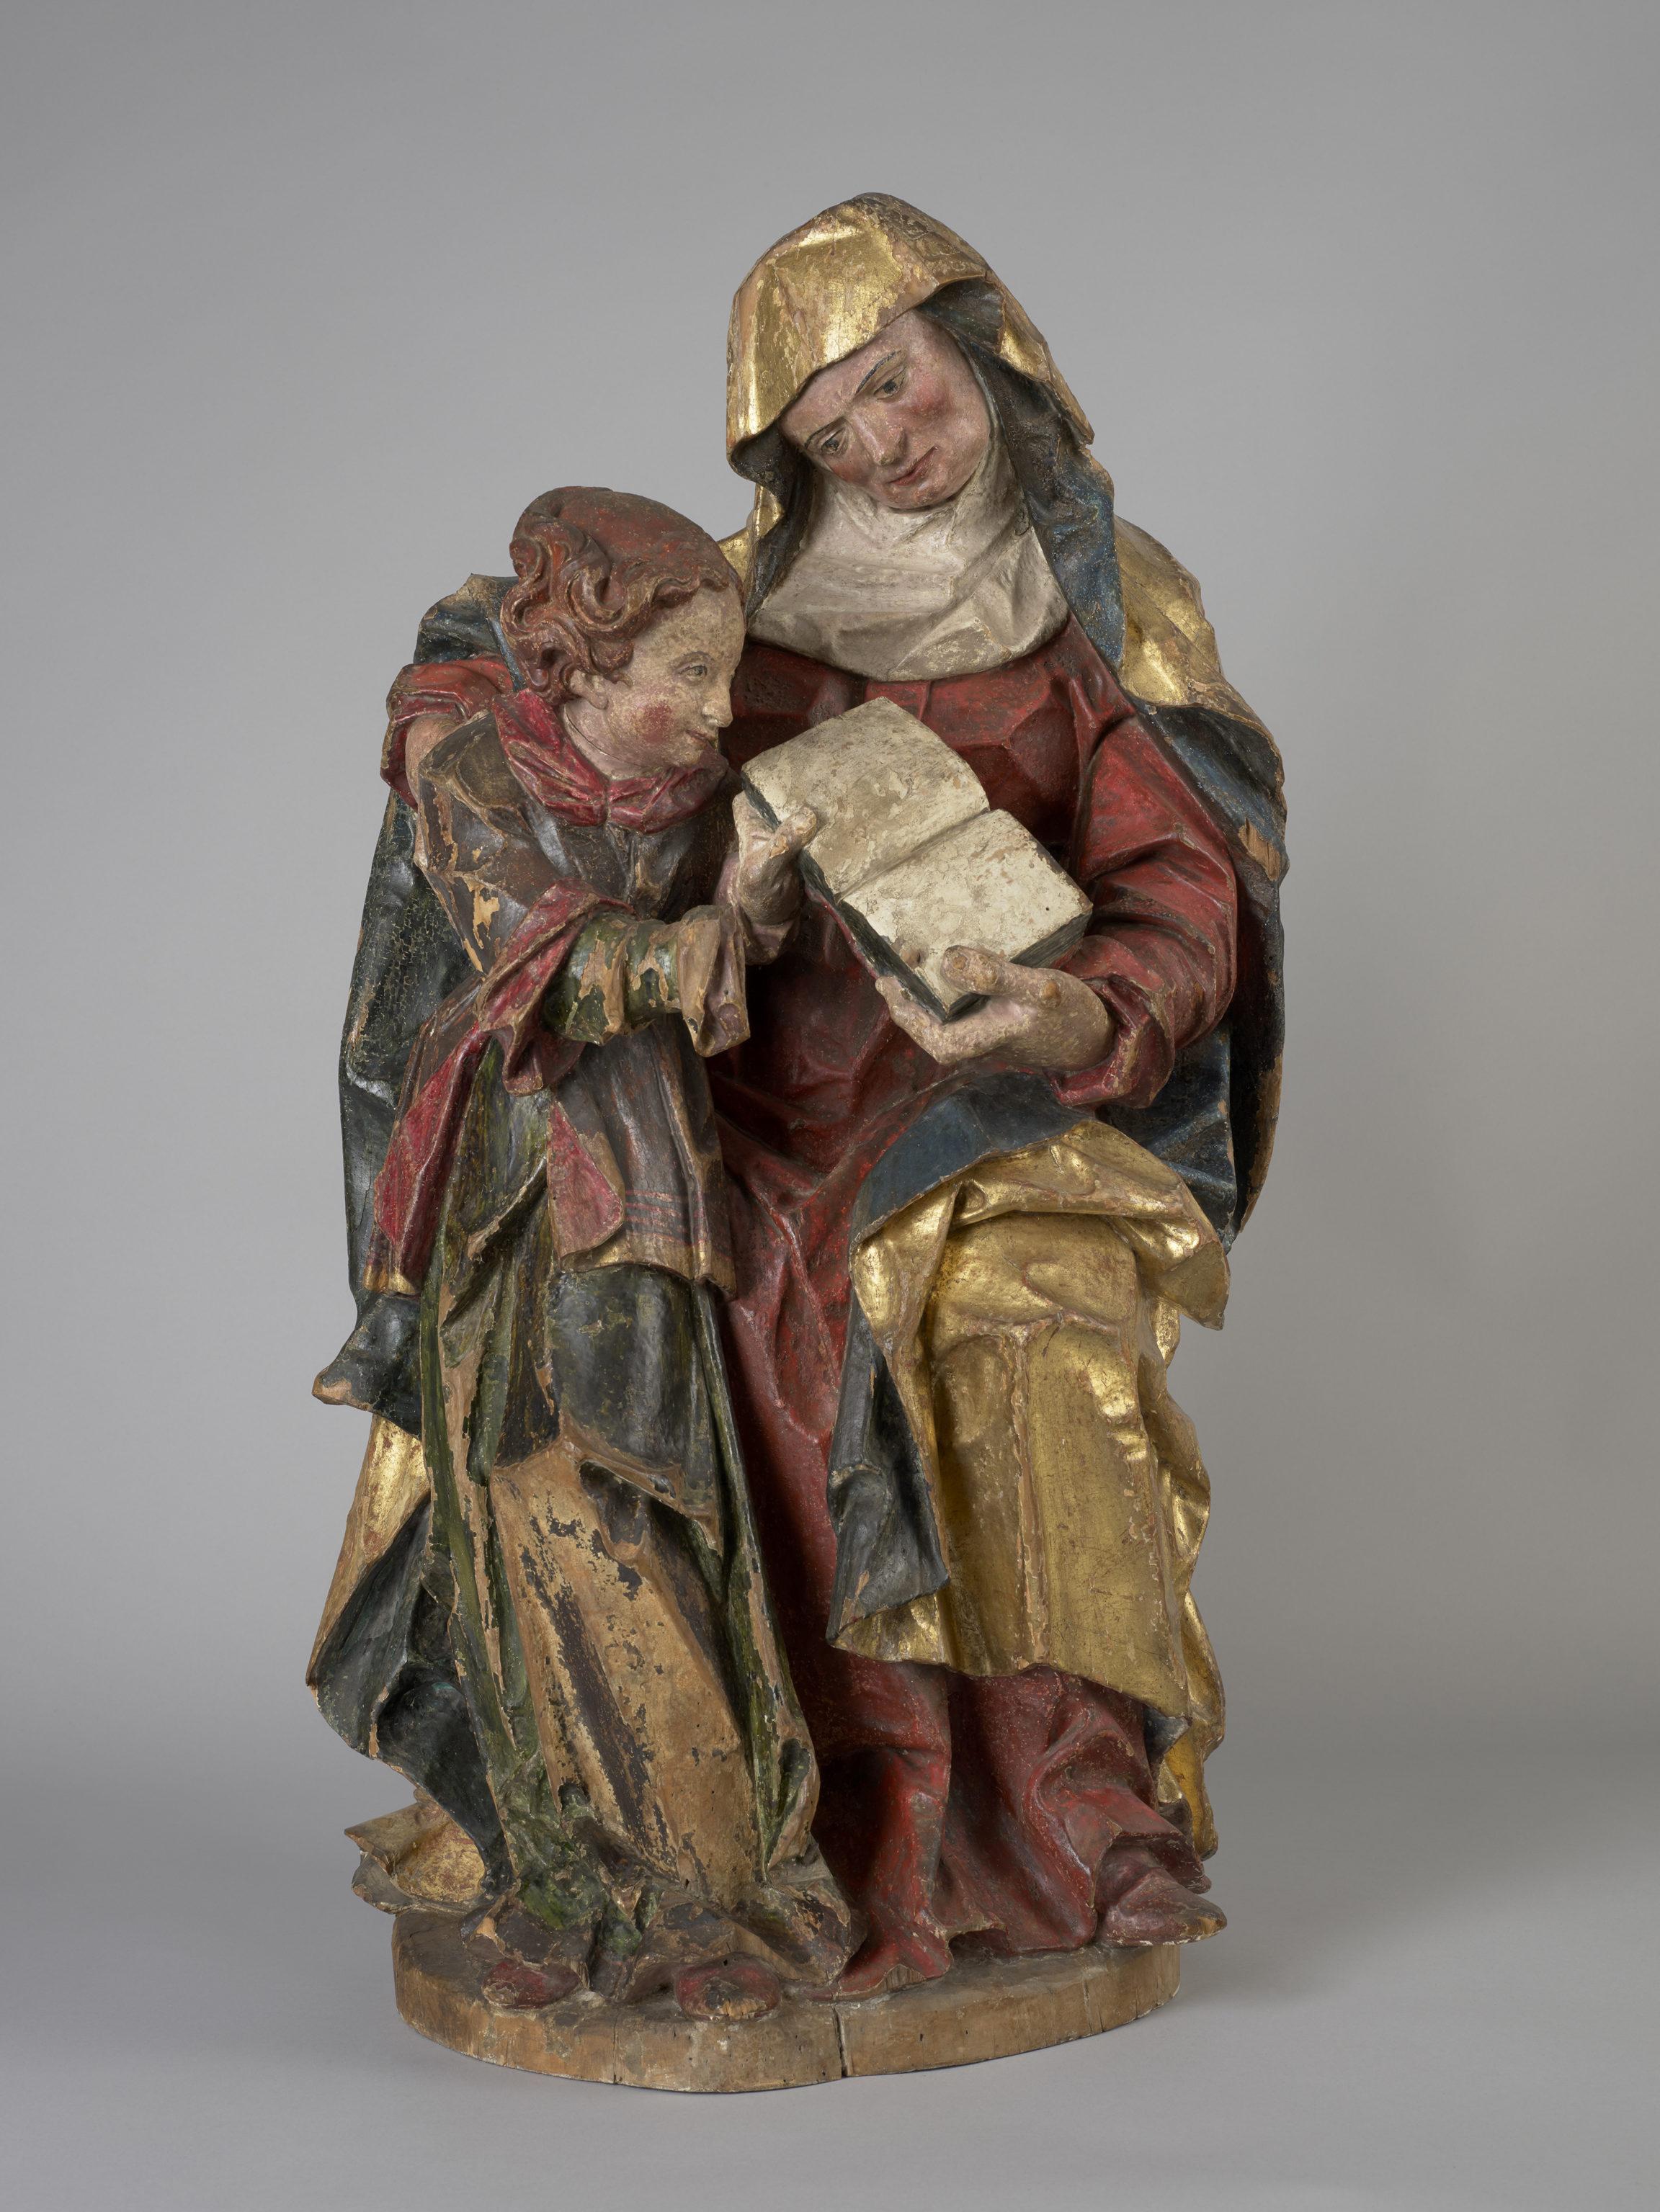 Inconnu [Suisse occidentale], Sainte Anne enseignant la Vierge, vers 1550-1580